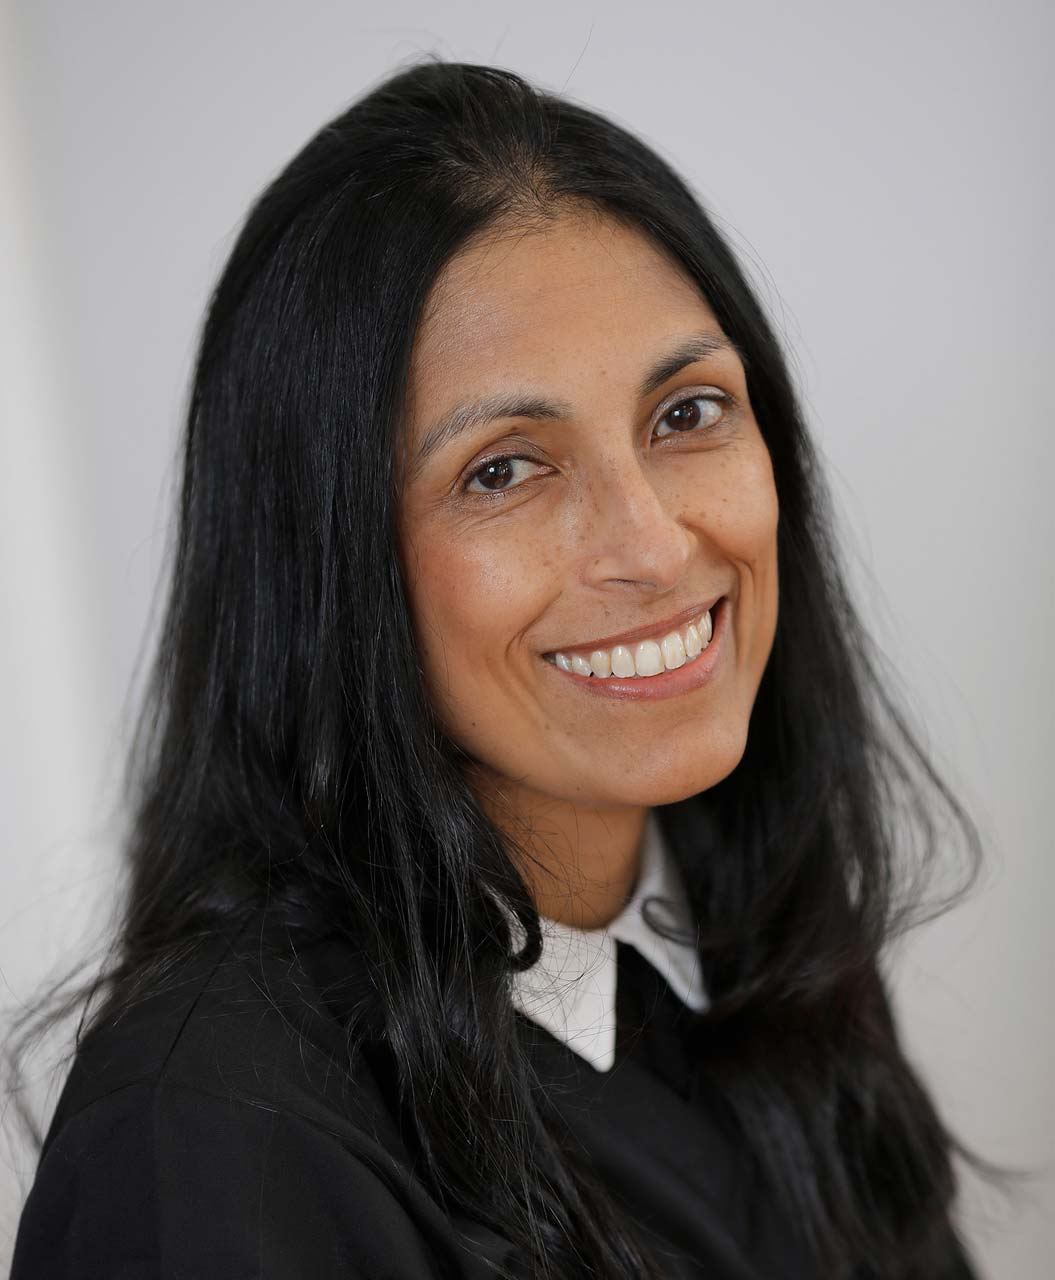 Anjil Patel